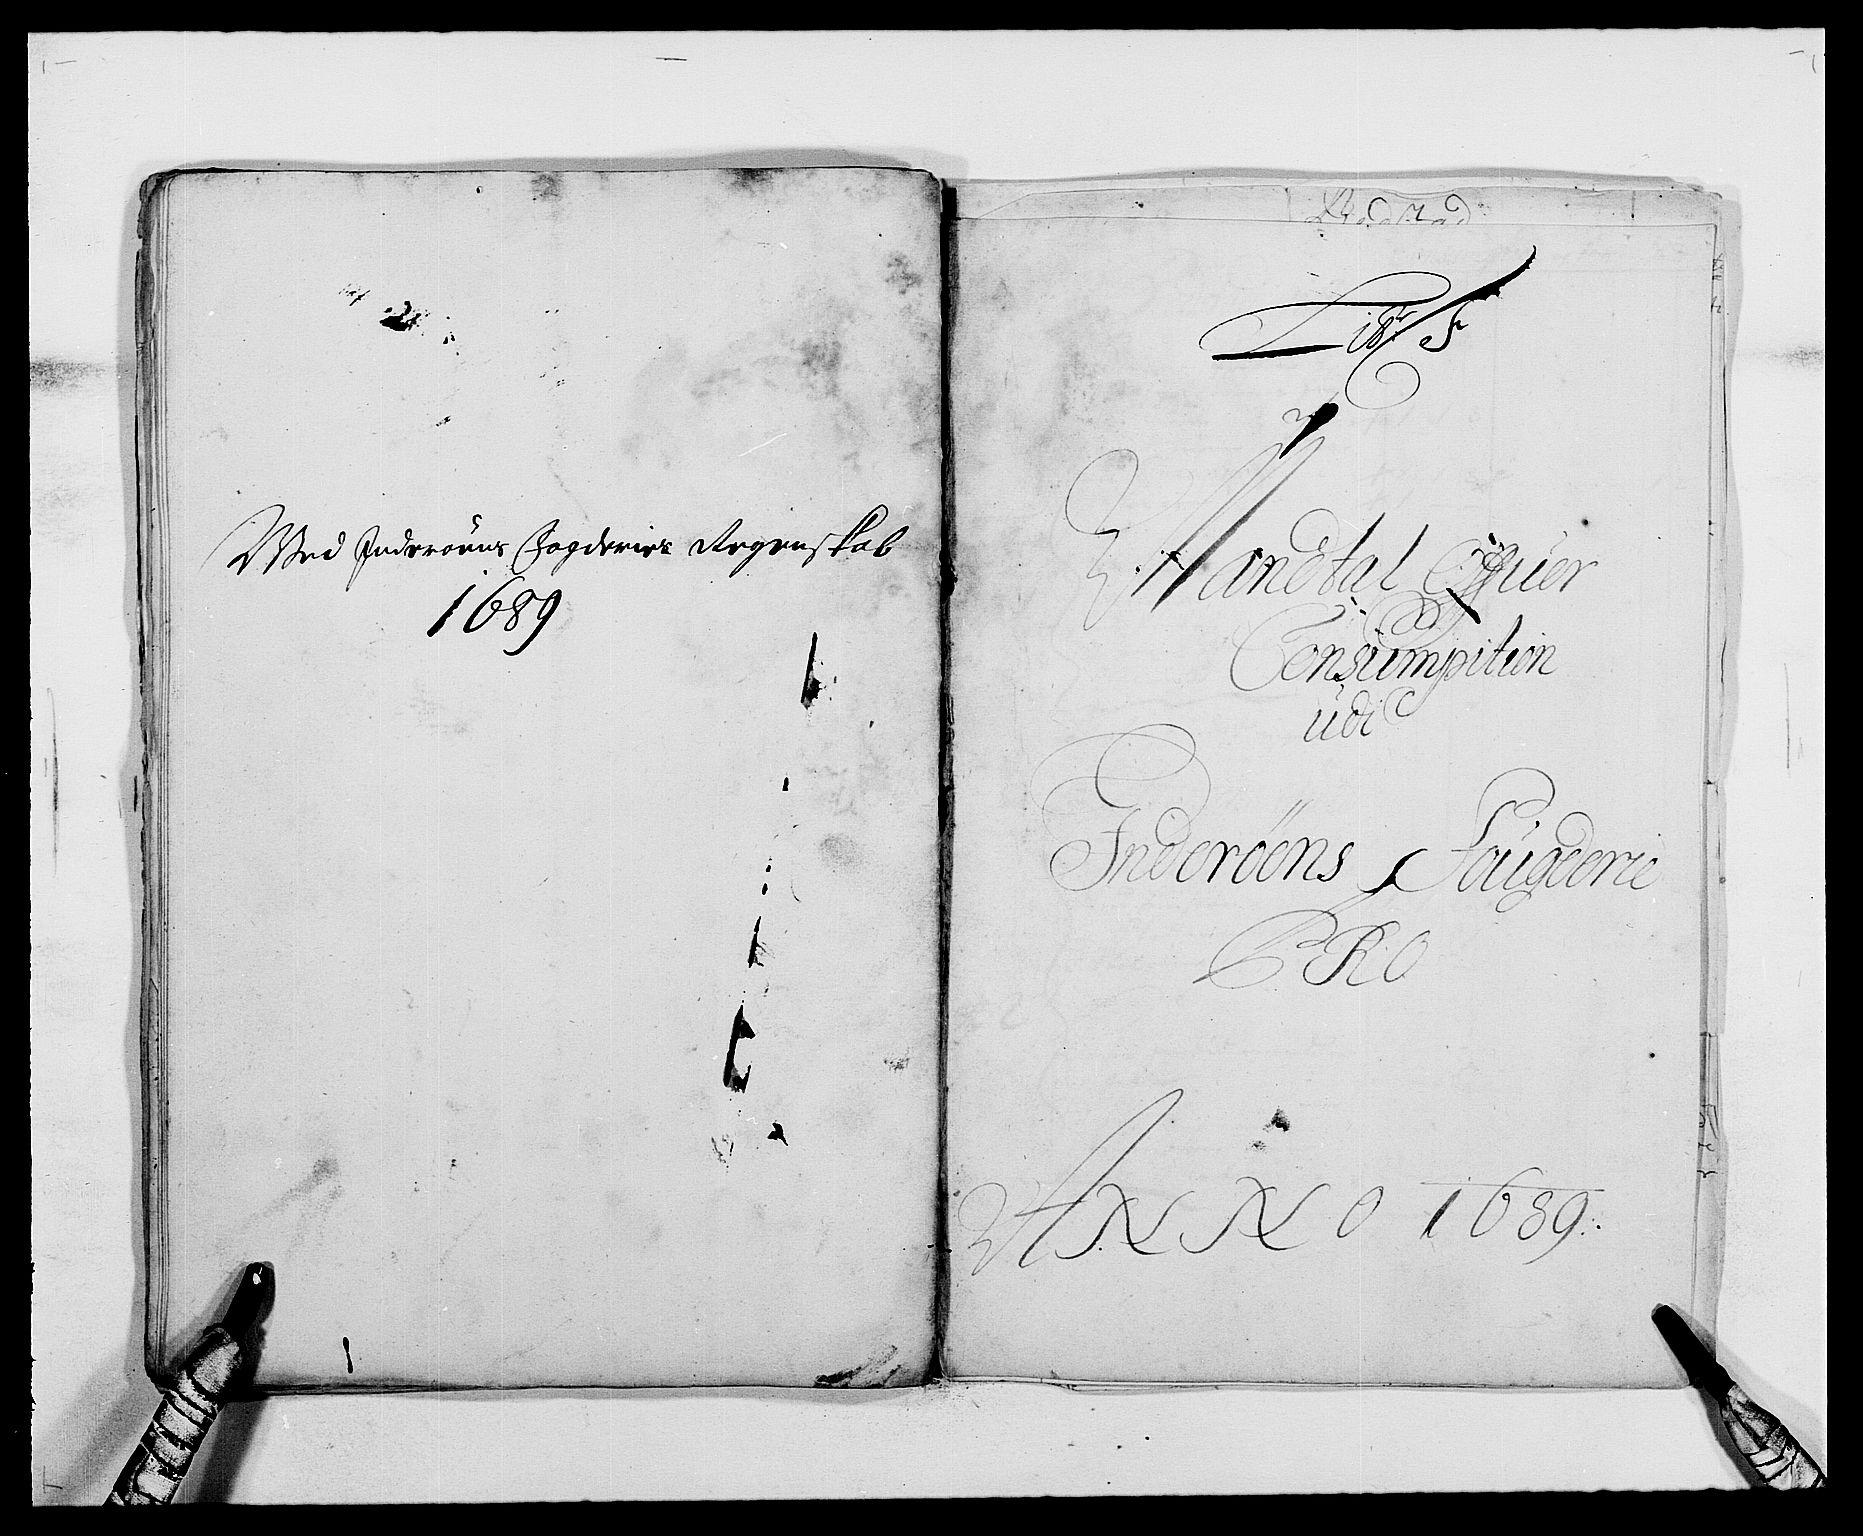 RA, Rentekammeret inntil 1814, Reviderte regnskaper, Fogderegnskap, R63/L4306: Fogderegnskap Inderøy, 1687-1689, s. 414